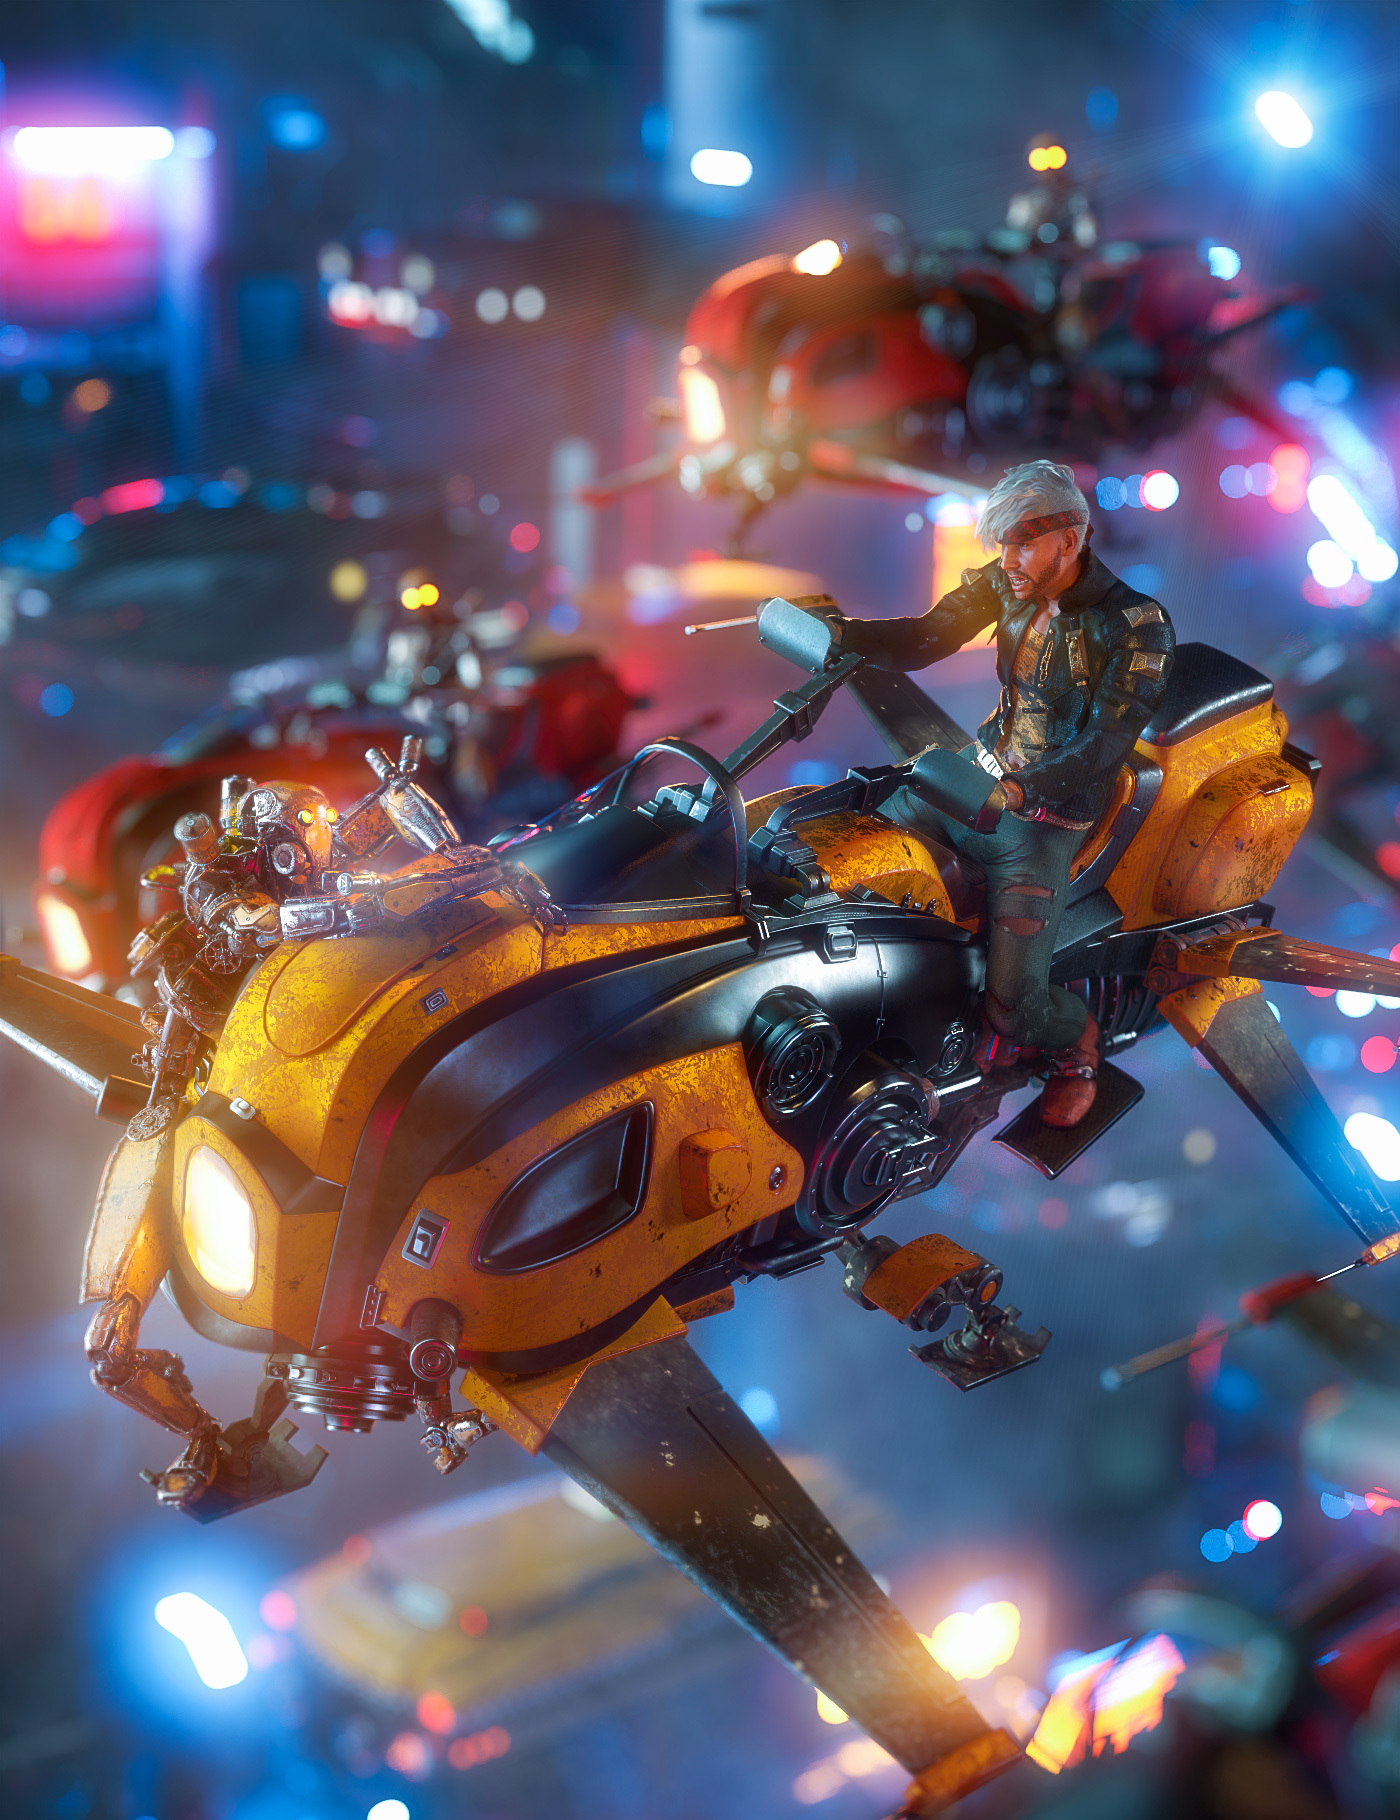 Dystopian Rider Bundle by: , 3D Models by Daz 3D